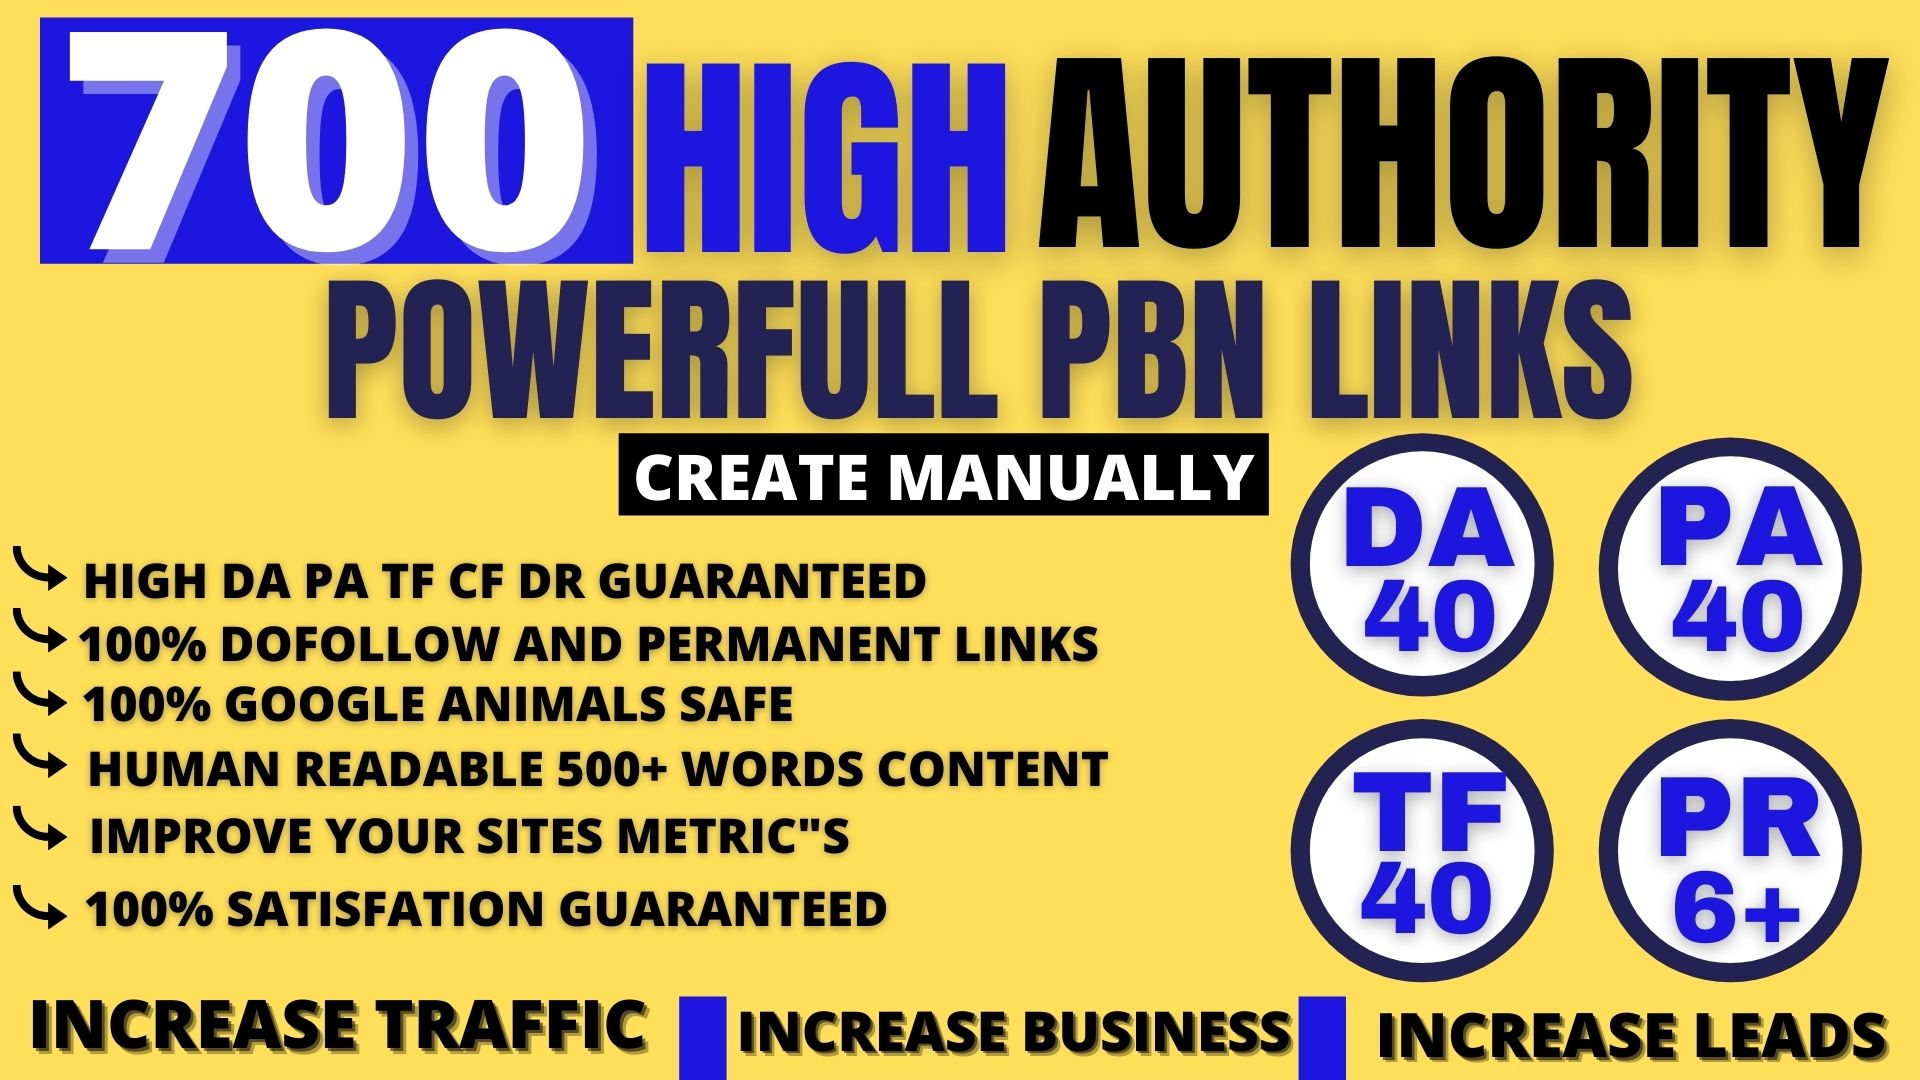 Build permanent 700 Pbn Backlink DA40+PA40+PR6+homepage web 2.0 with dofollow unique site